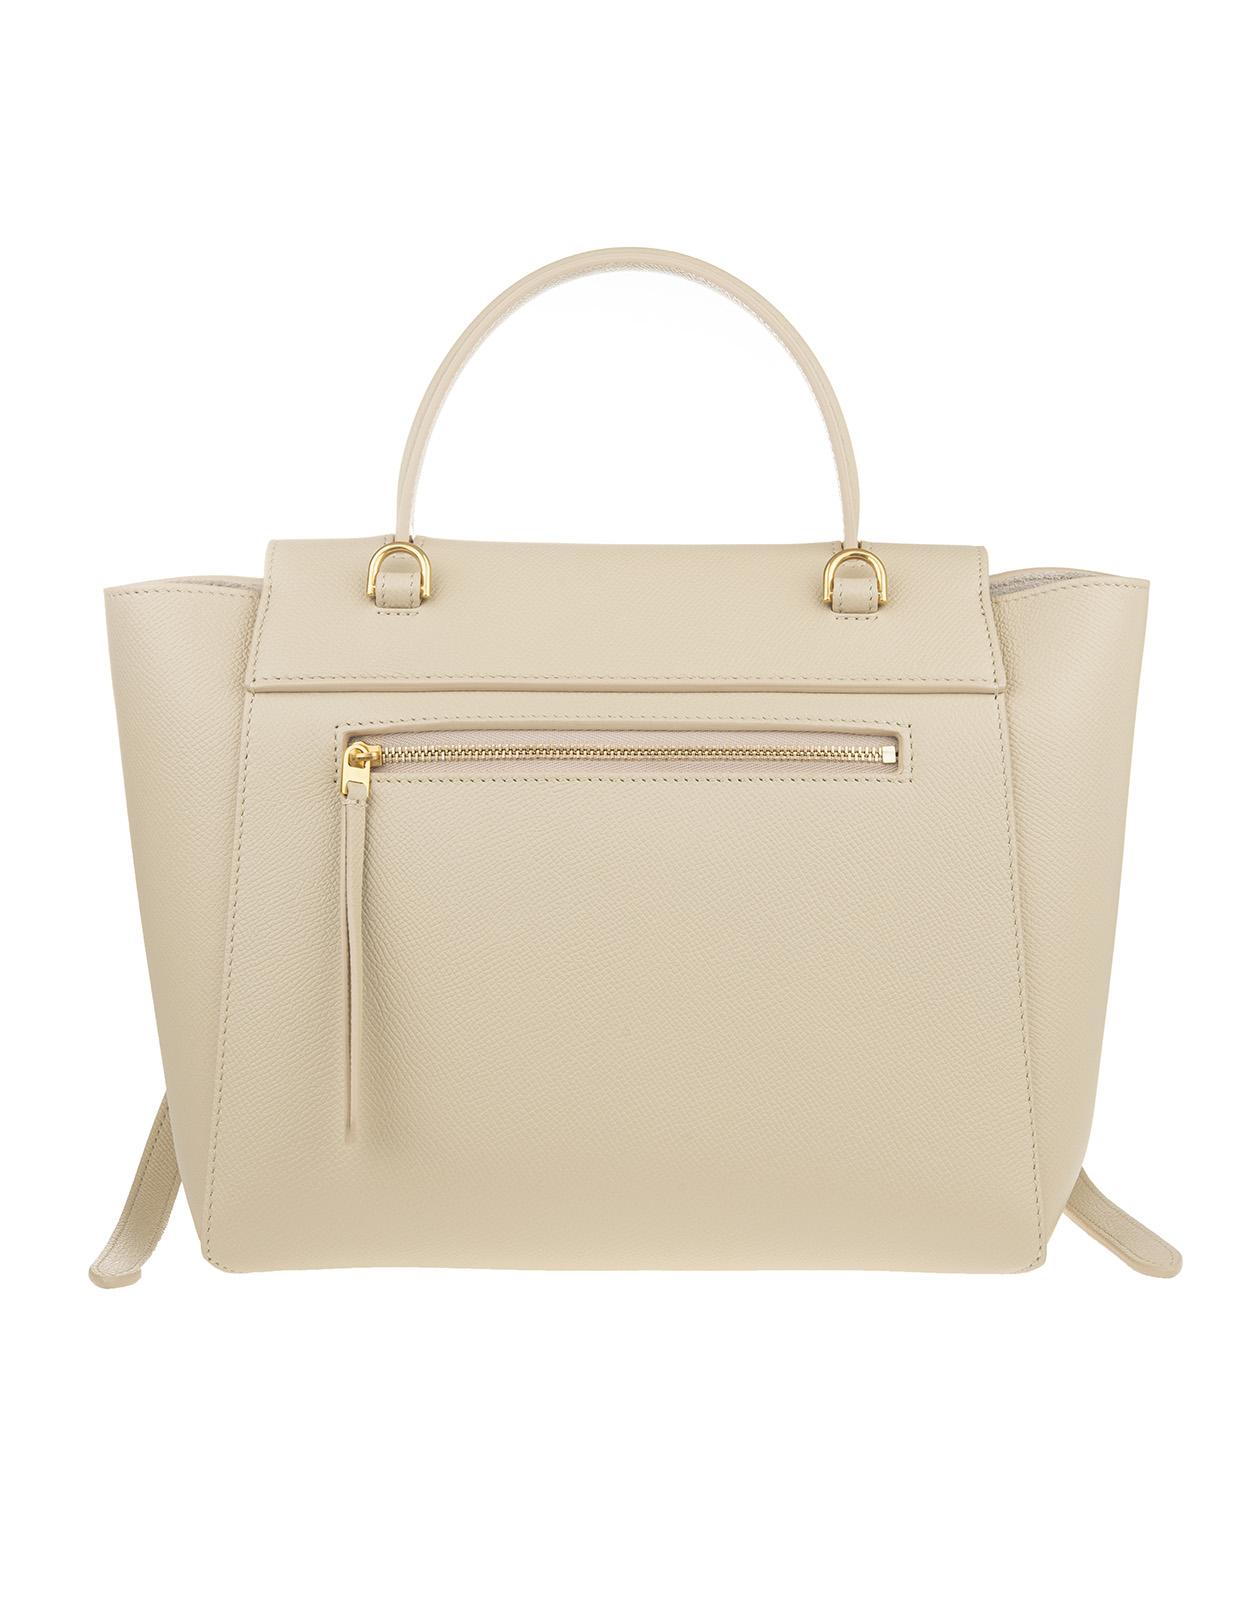 Micro Belt Bag In Cream Grained Calf Leather Celine Russocapri